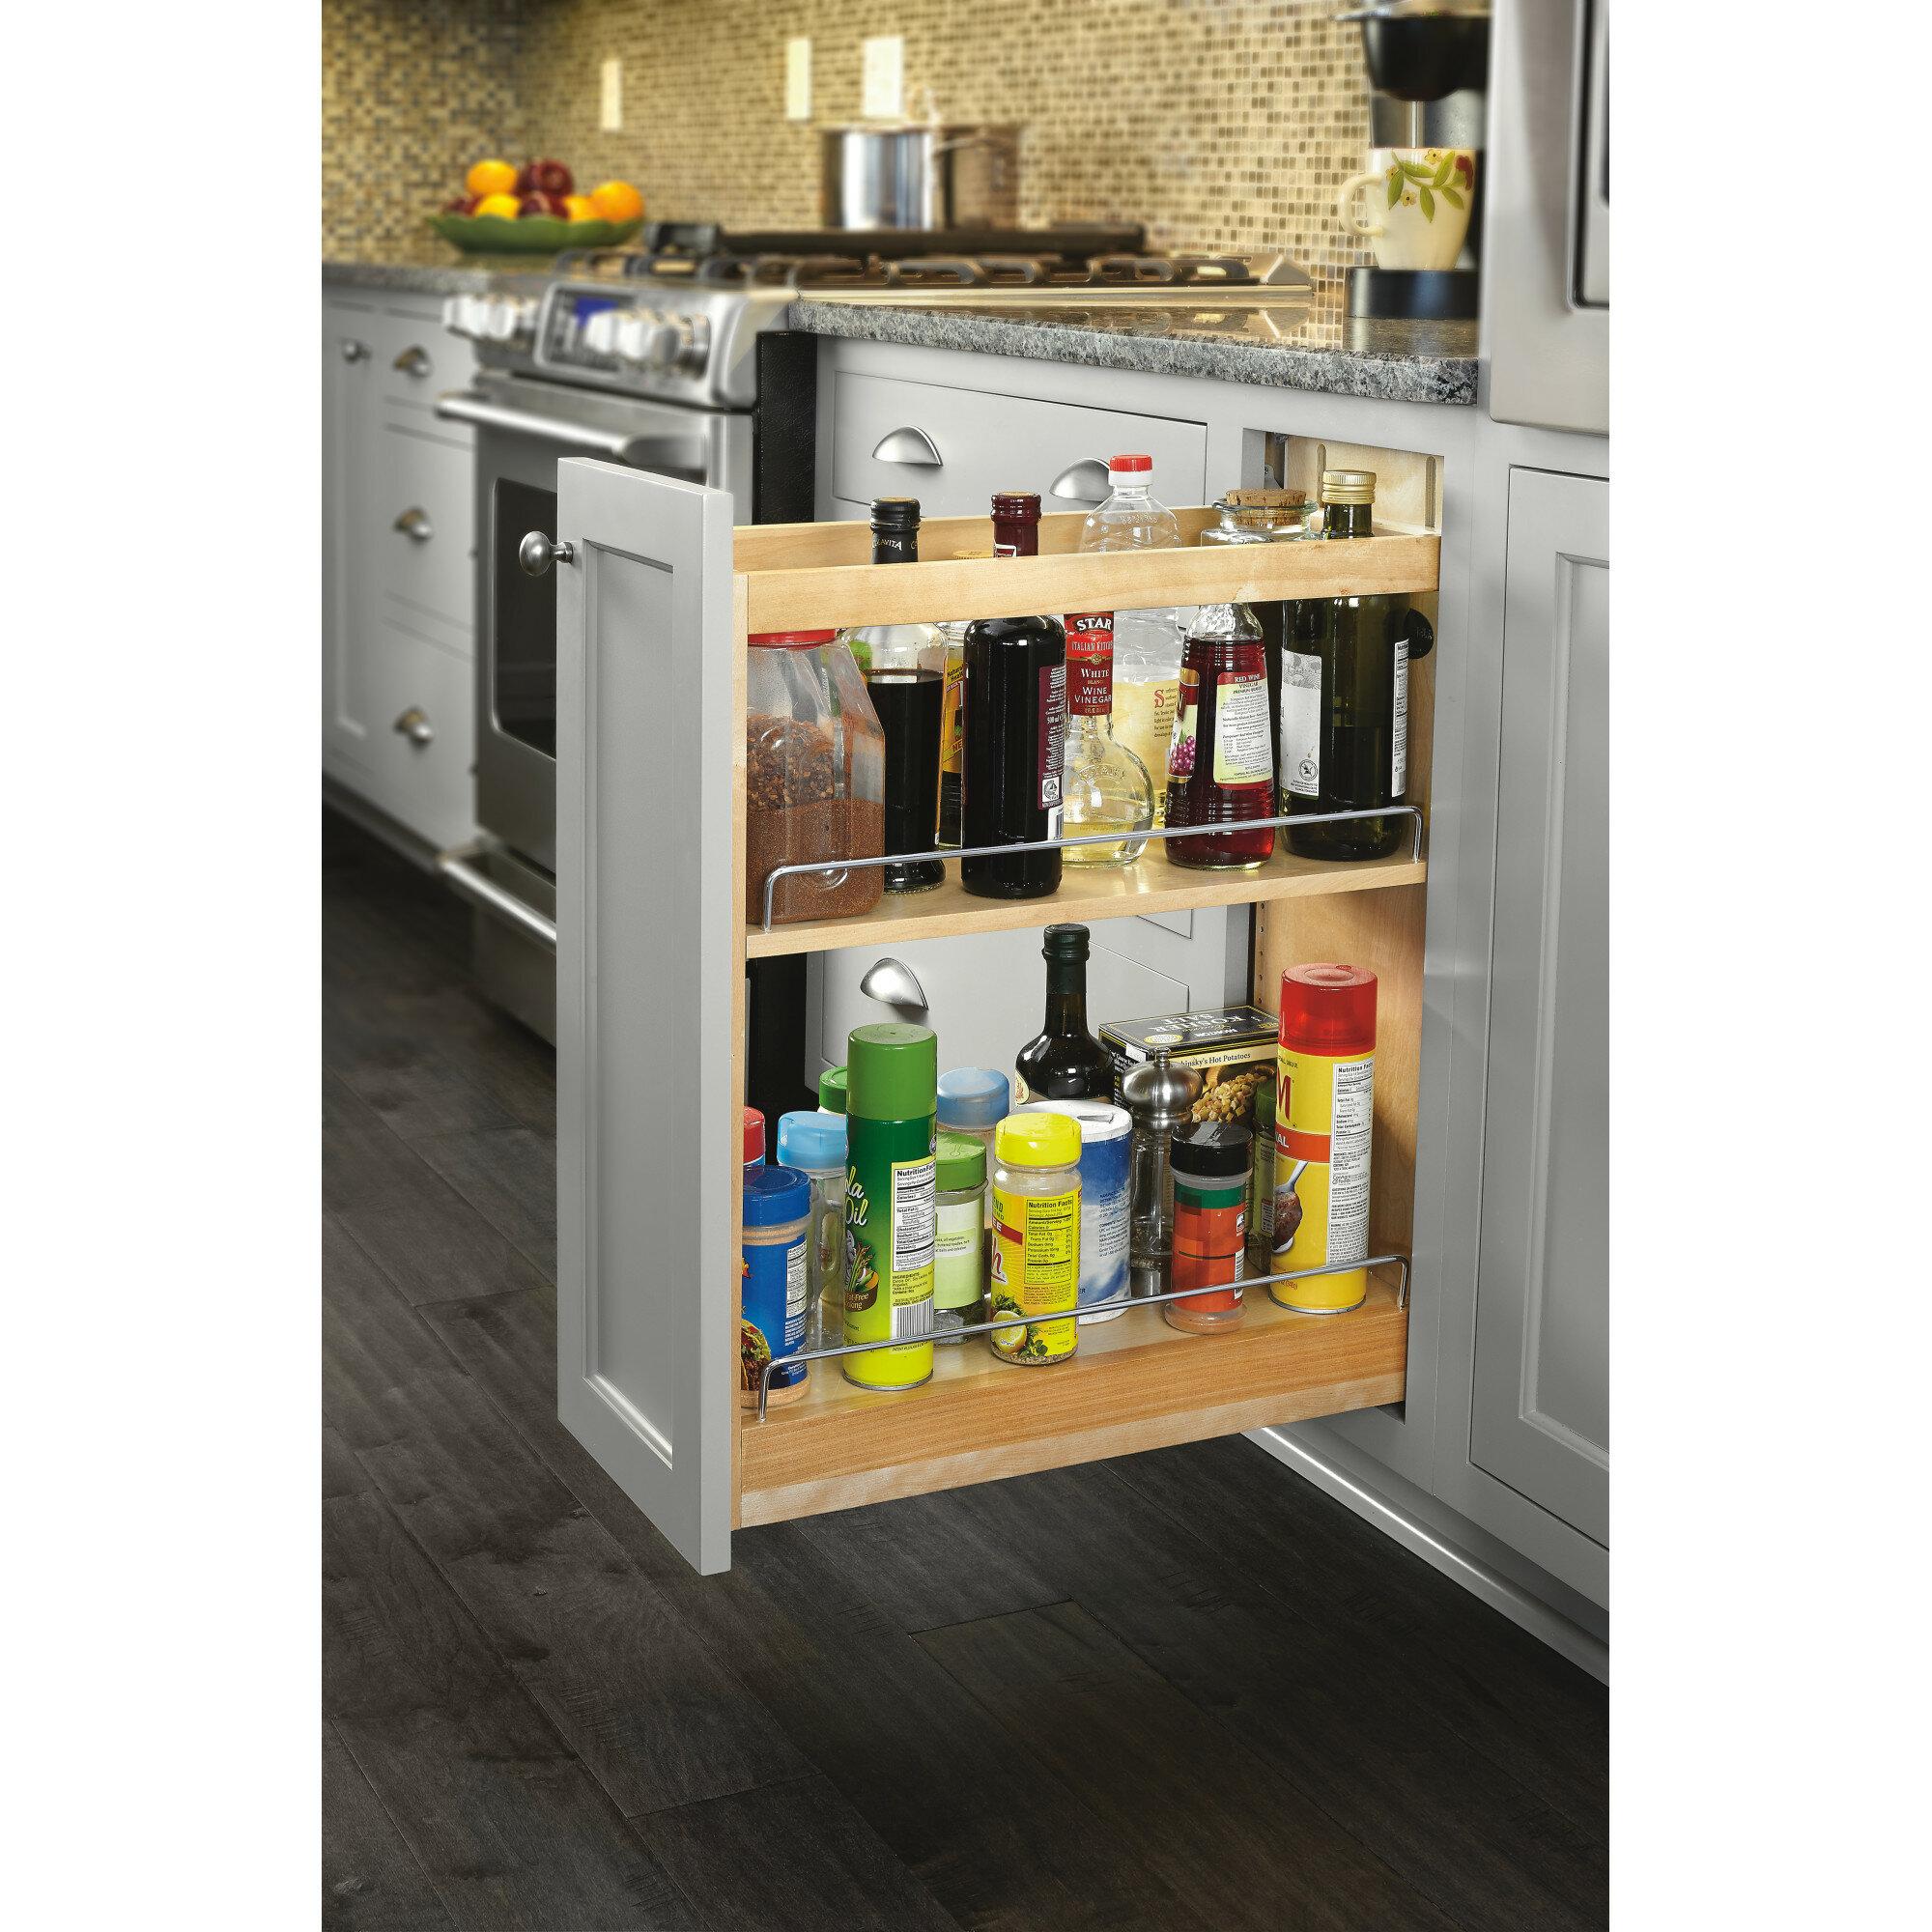 Rev A Shelf Soft Close Base Cabinet Organizer Pull Out Pantry Reviews Wayfair